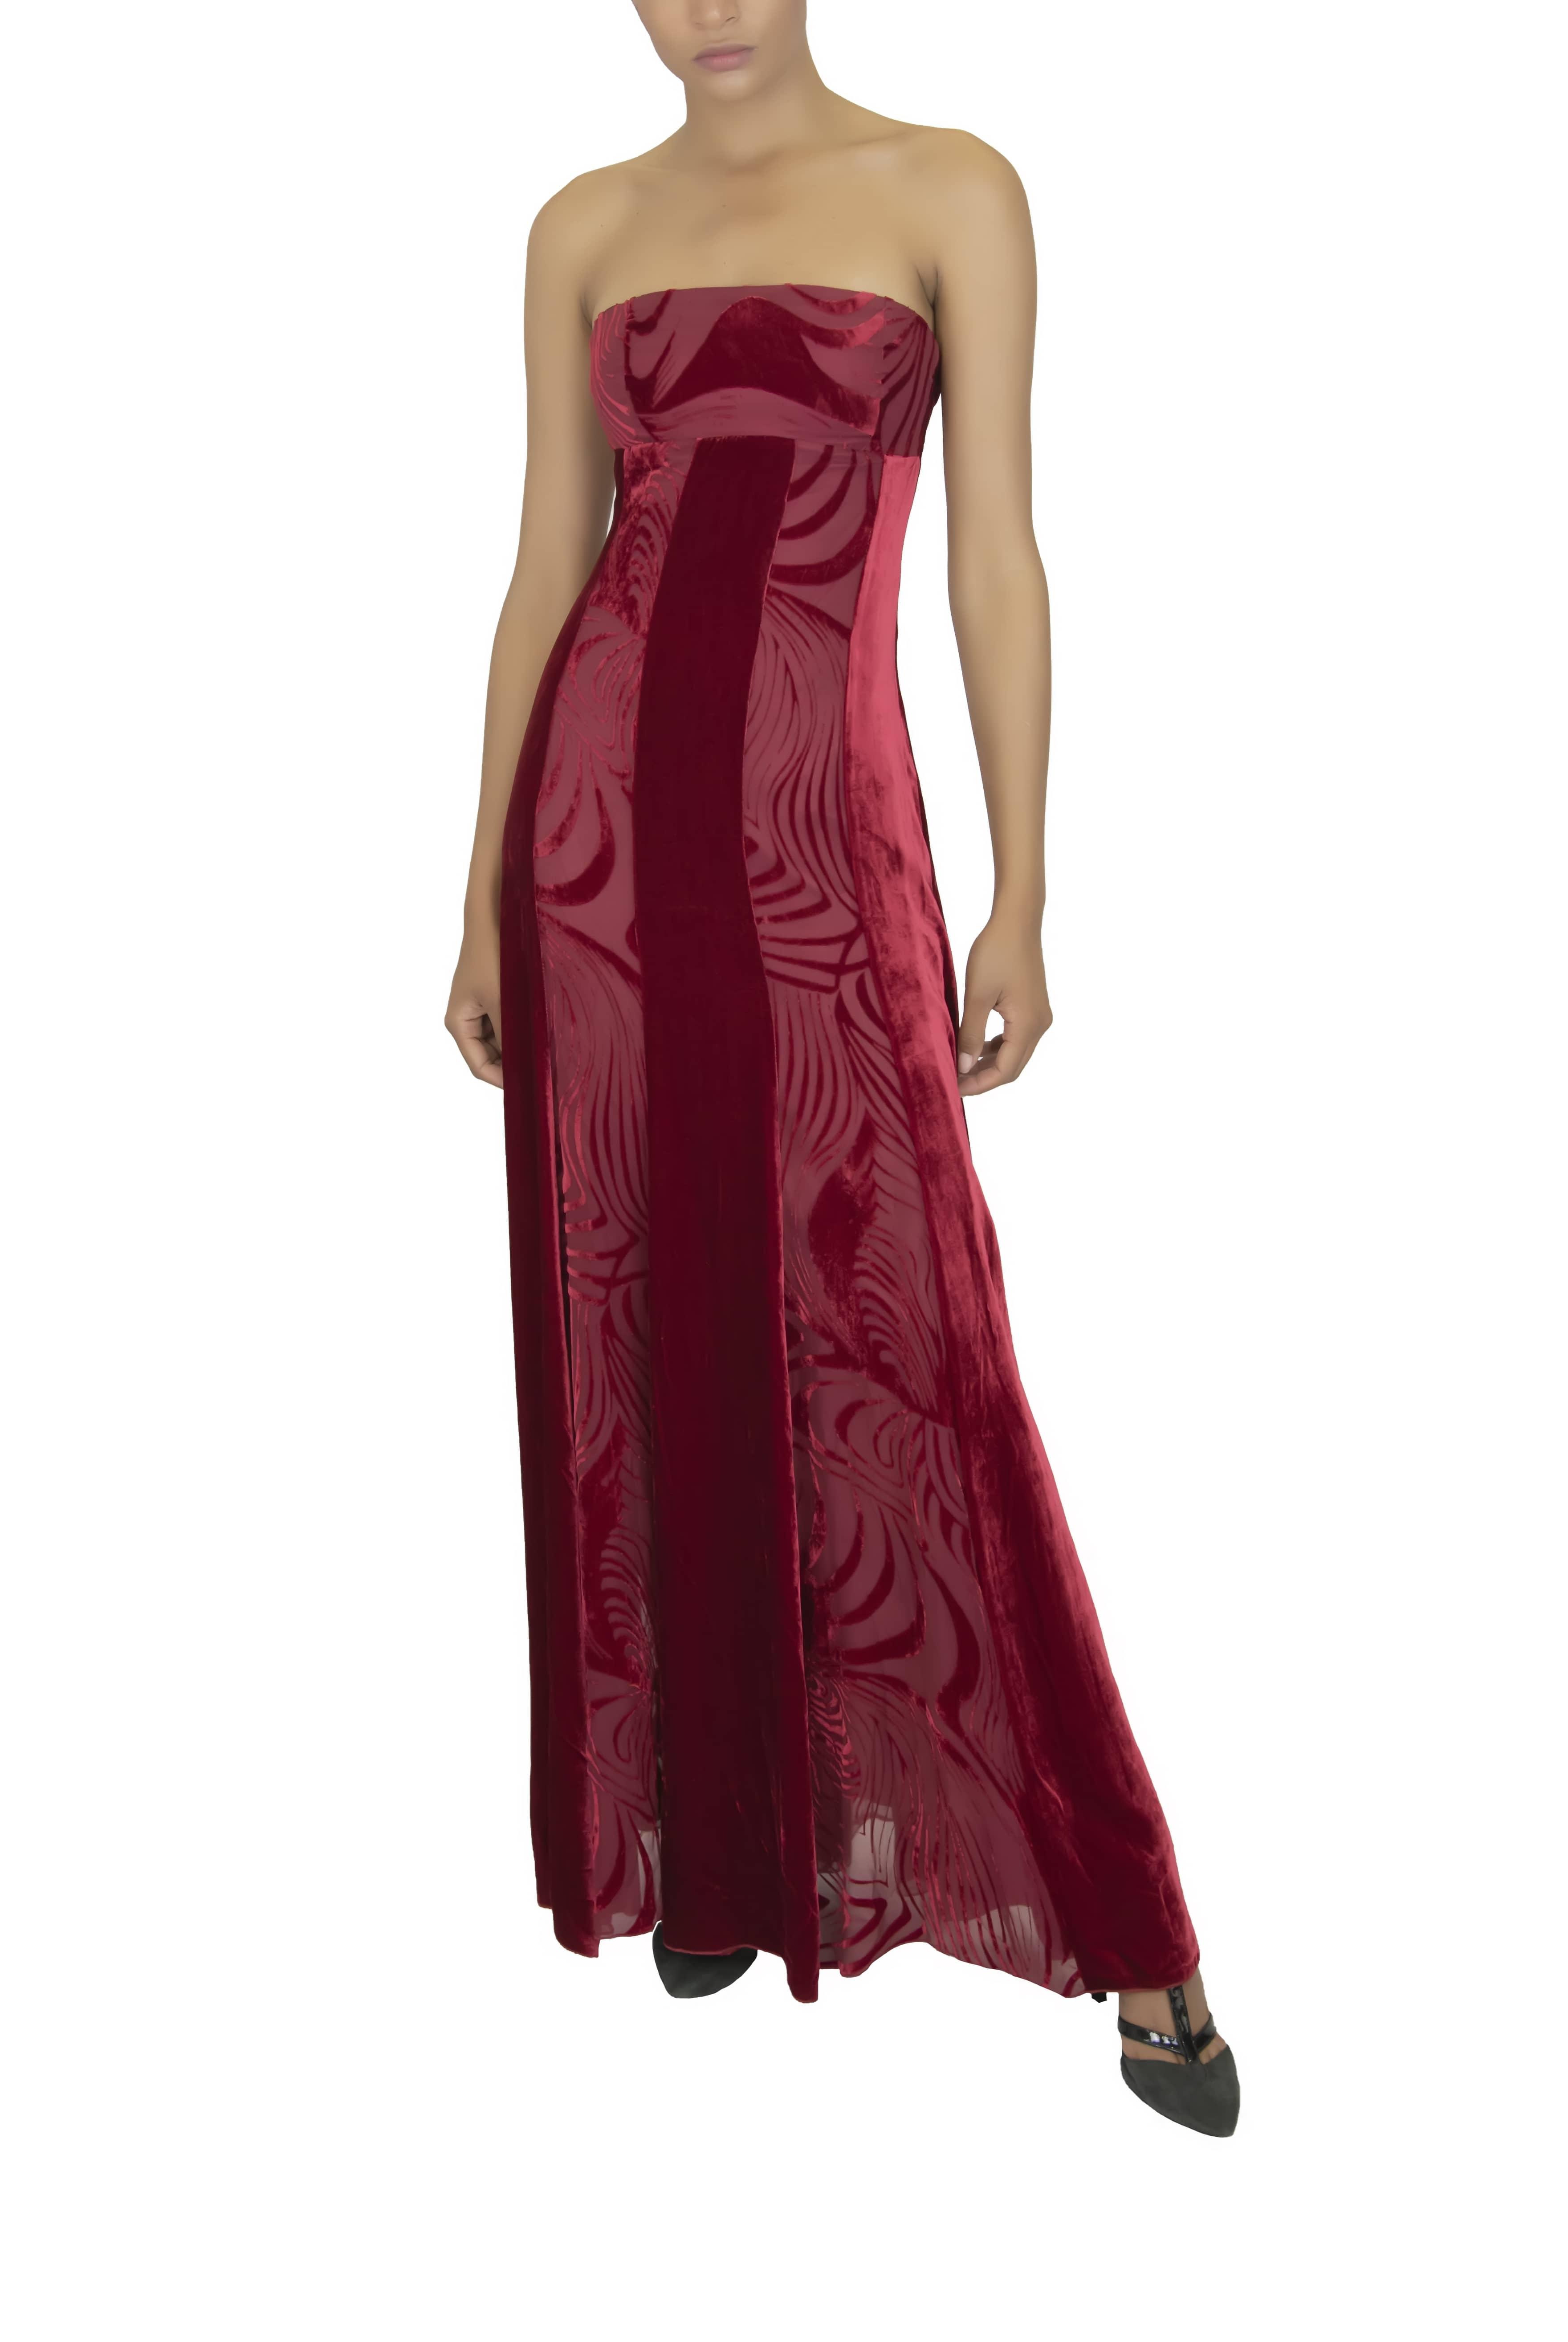 Dress FULU 1